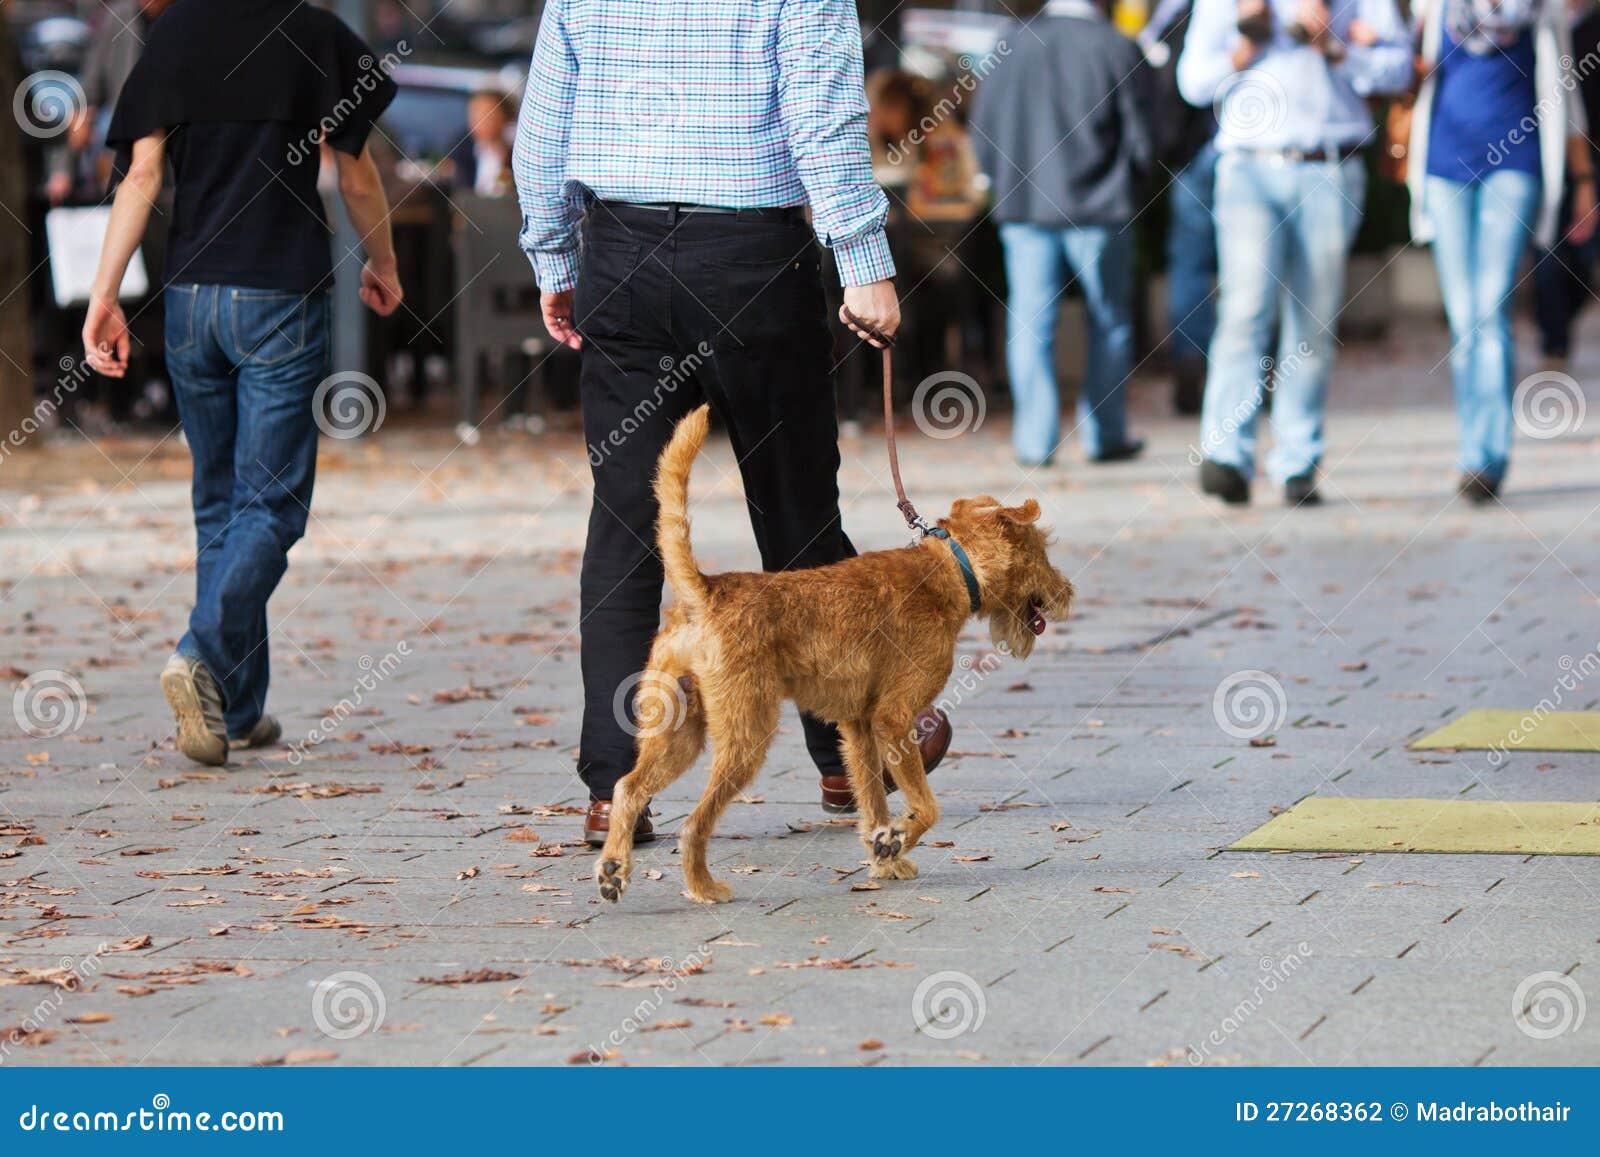 Man Walking Dog : Man walking a dog in the city stock photo image